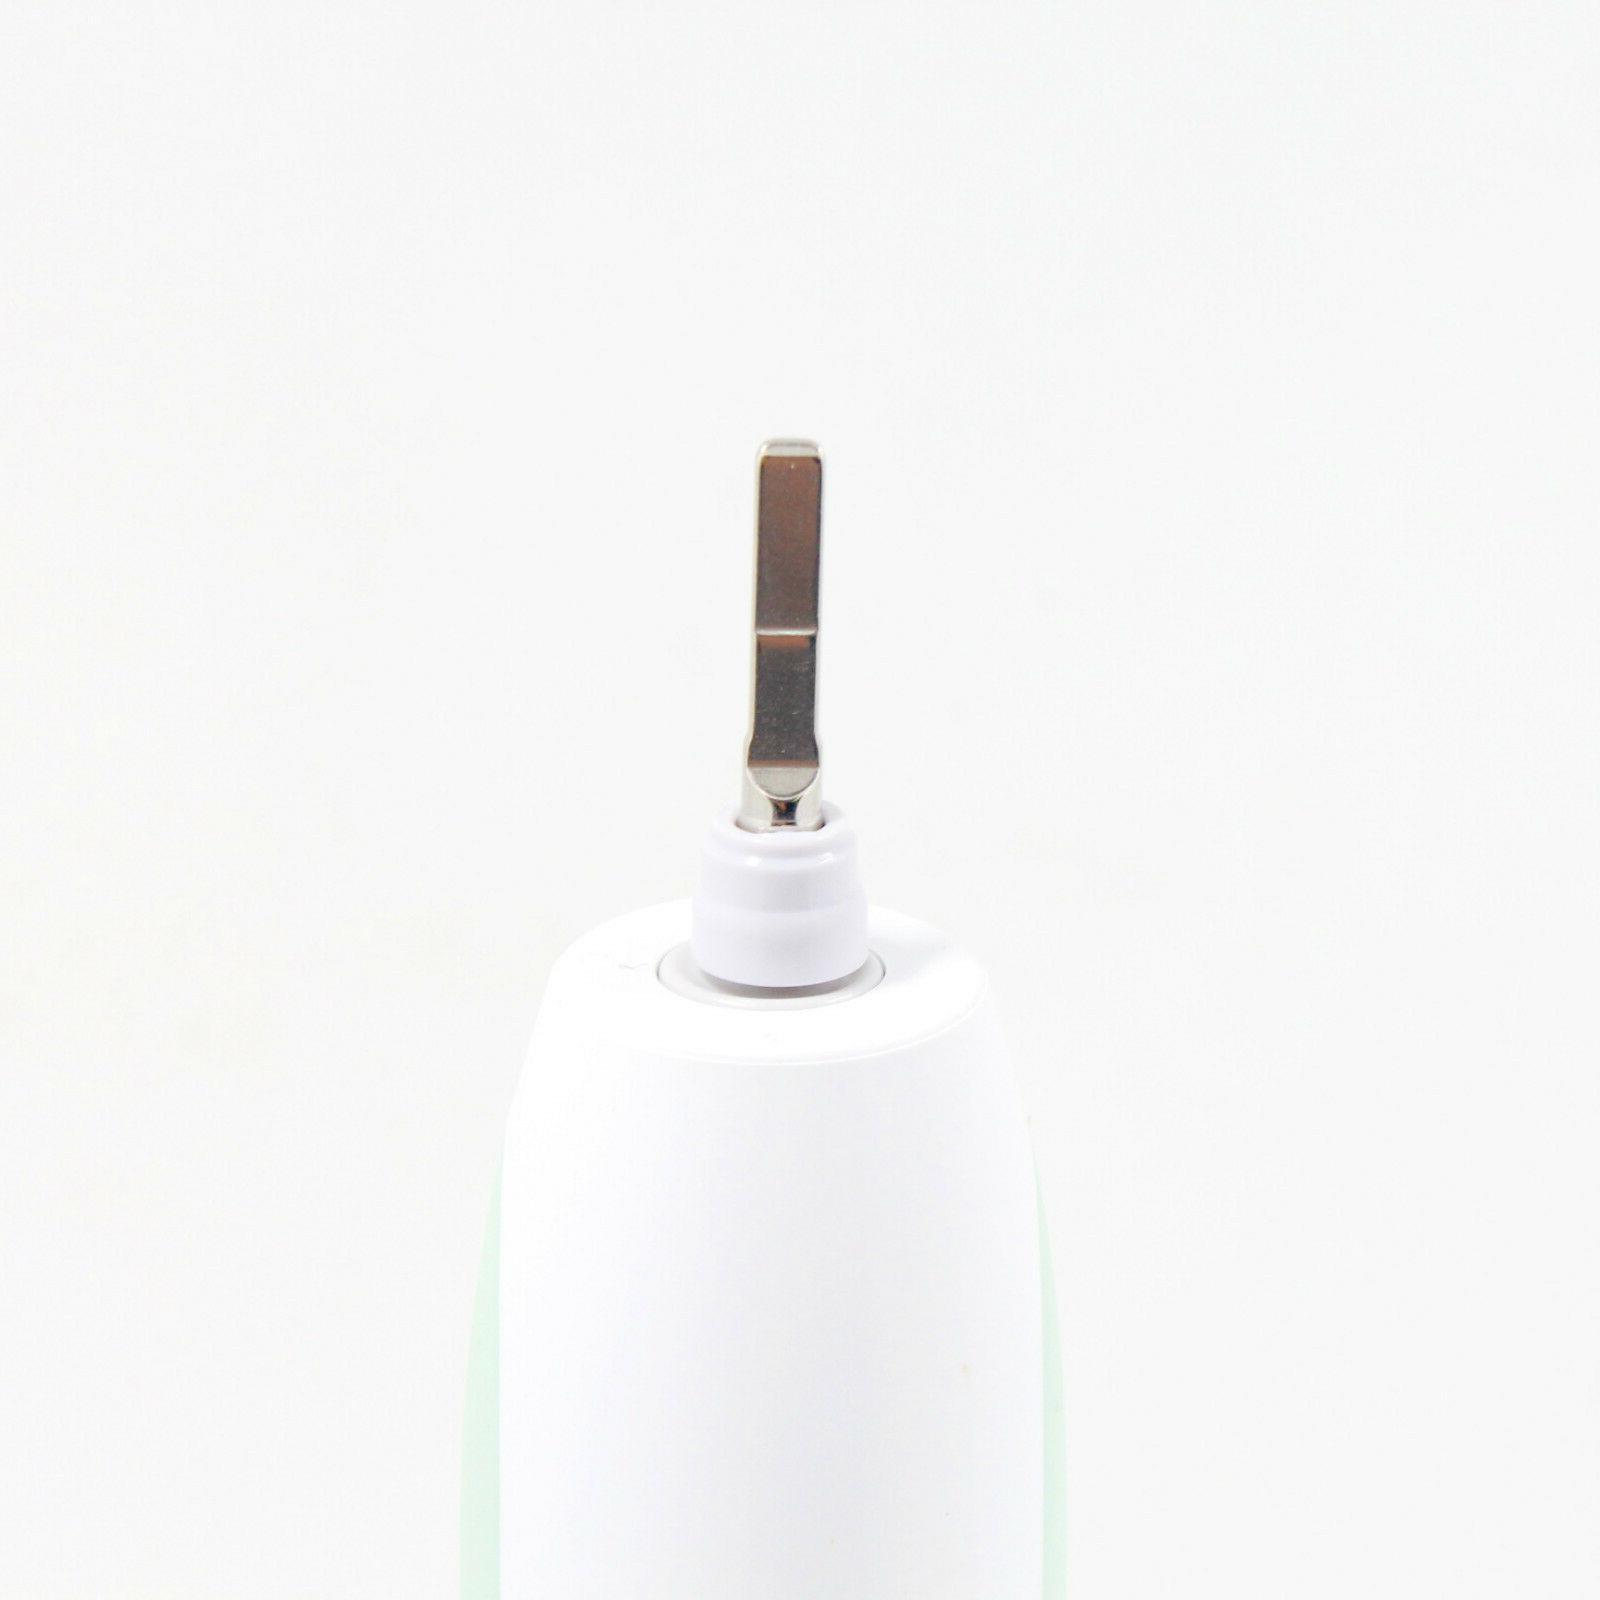 NEW Flexcare HX6920/6930/HX6750 RS910 Toothbrush HX6920